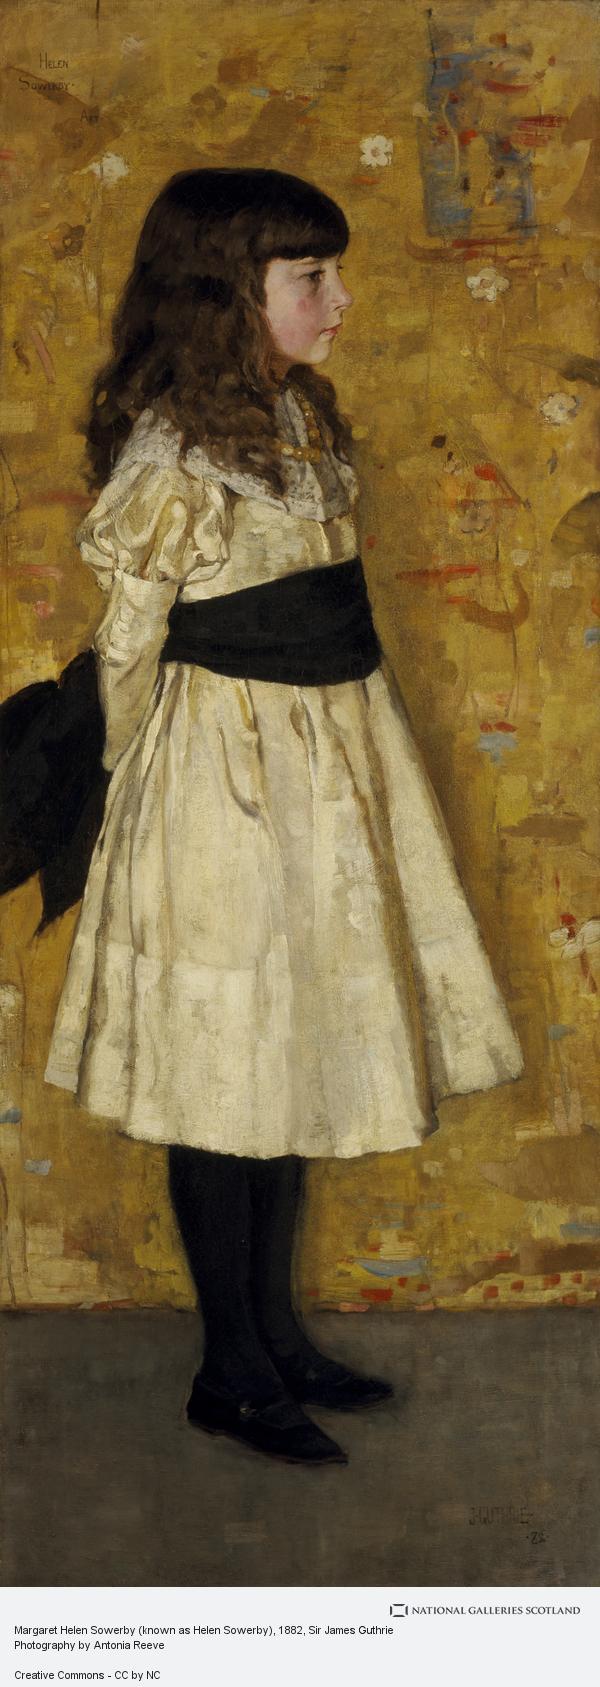 Sir James Guthrie, Margaret Helen Sowerby (known as Helen Sowerby)